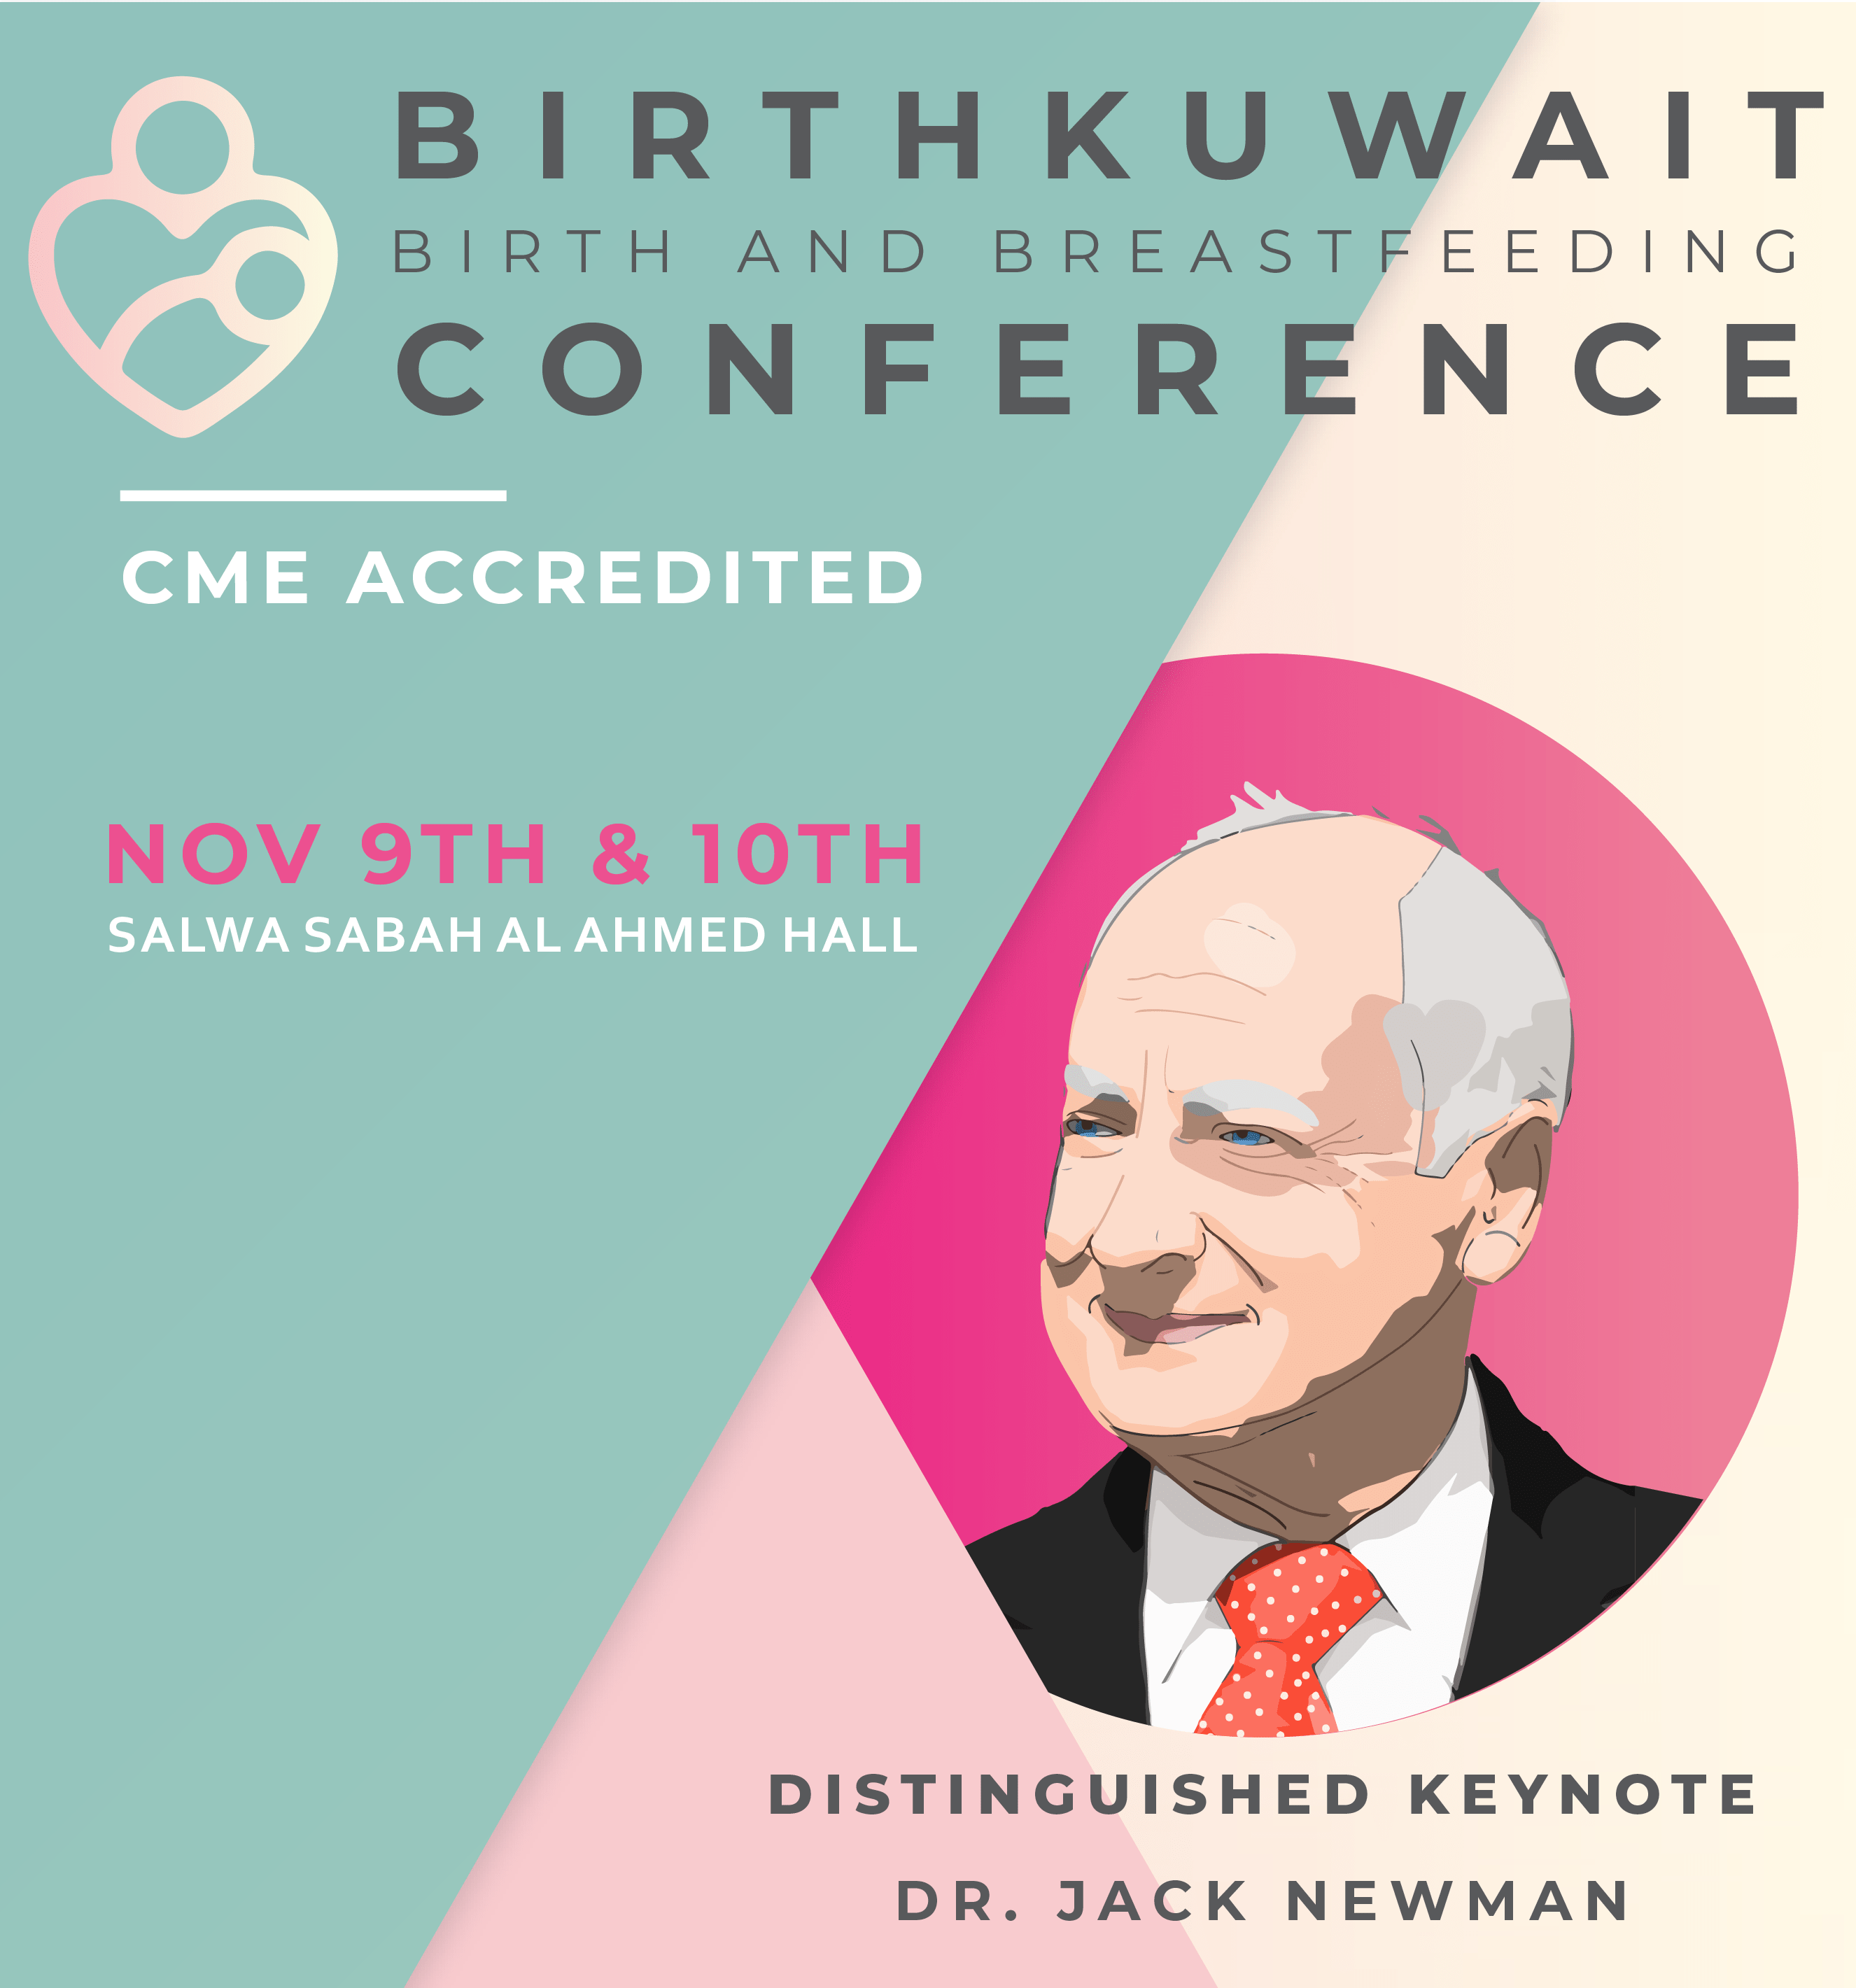 Keynote Speaker: Dr Jack Newman